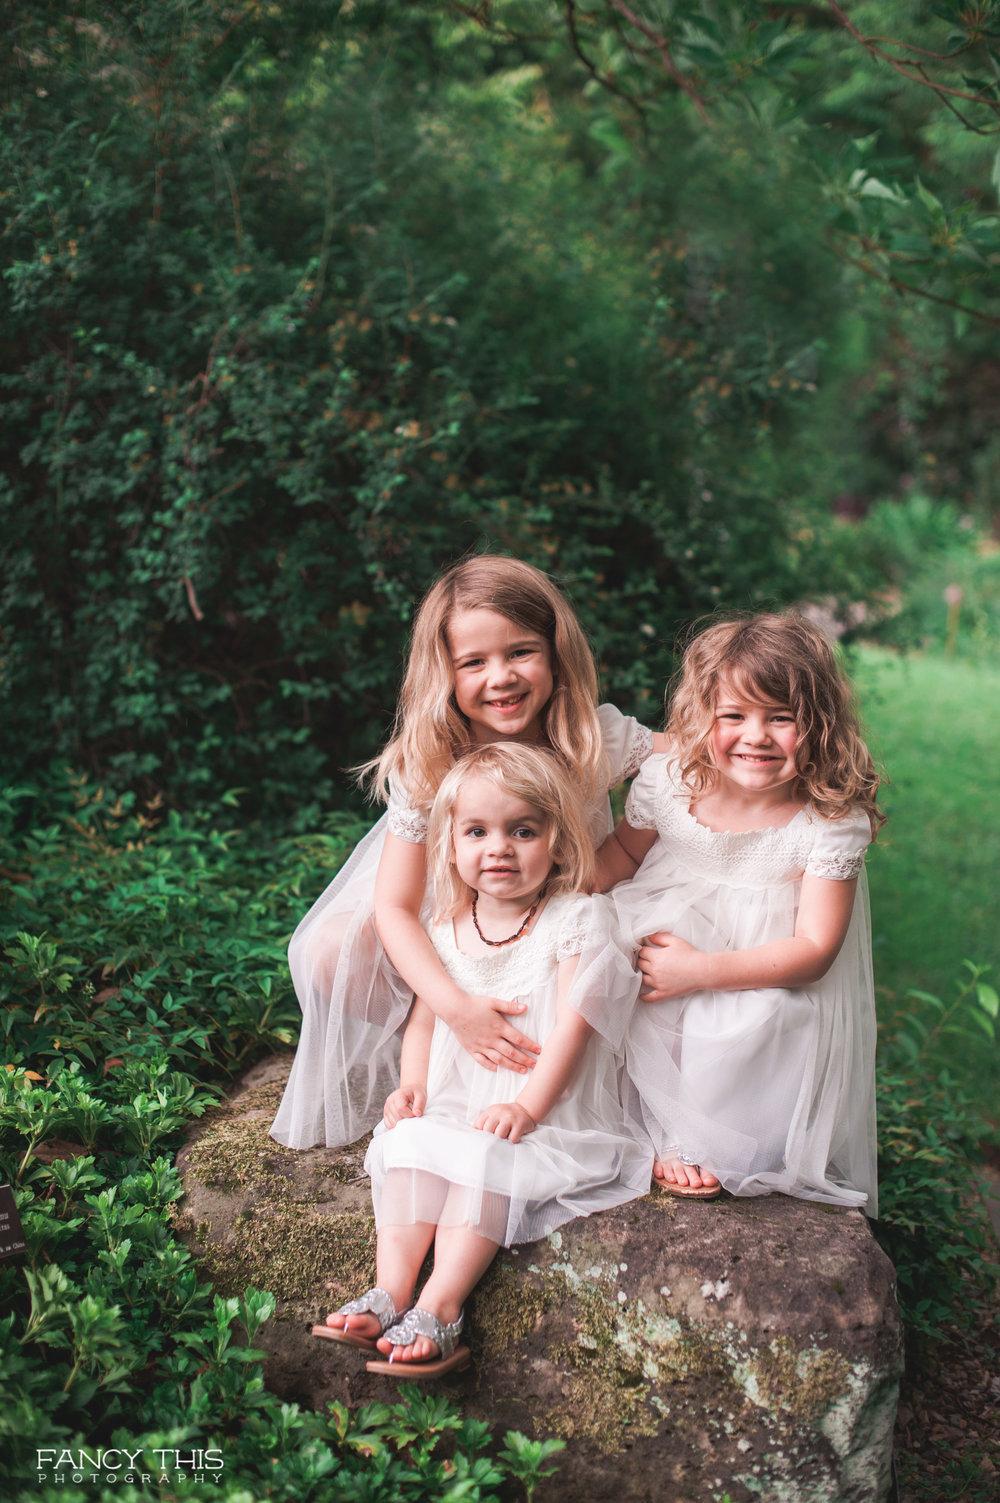 gobletfamily_socialmediaready-2.jpg